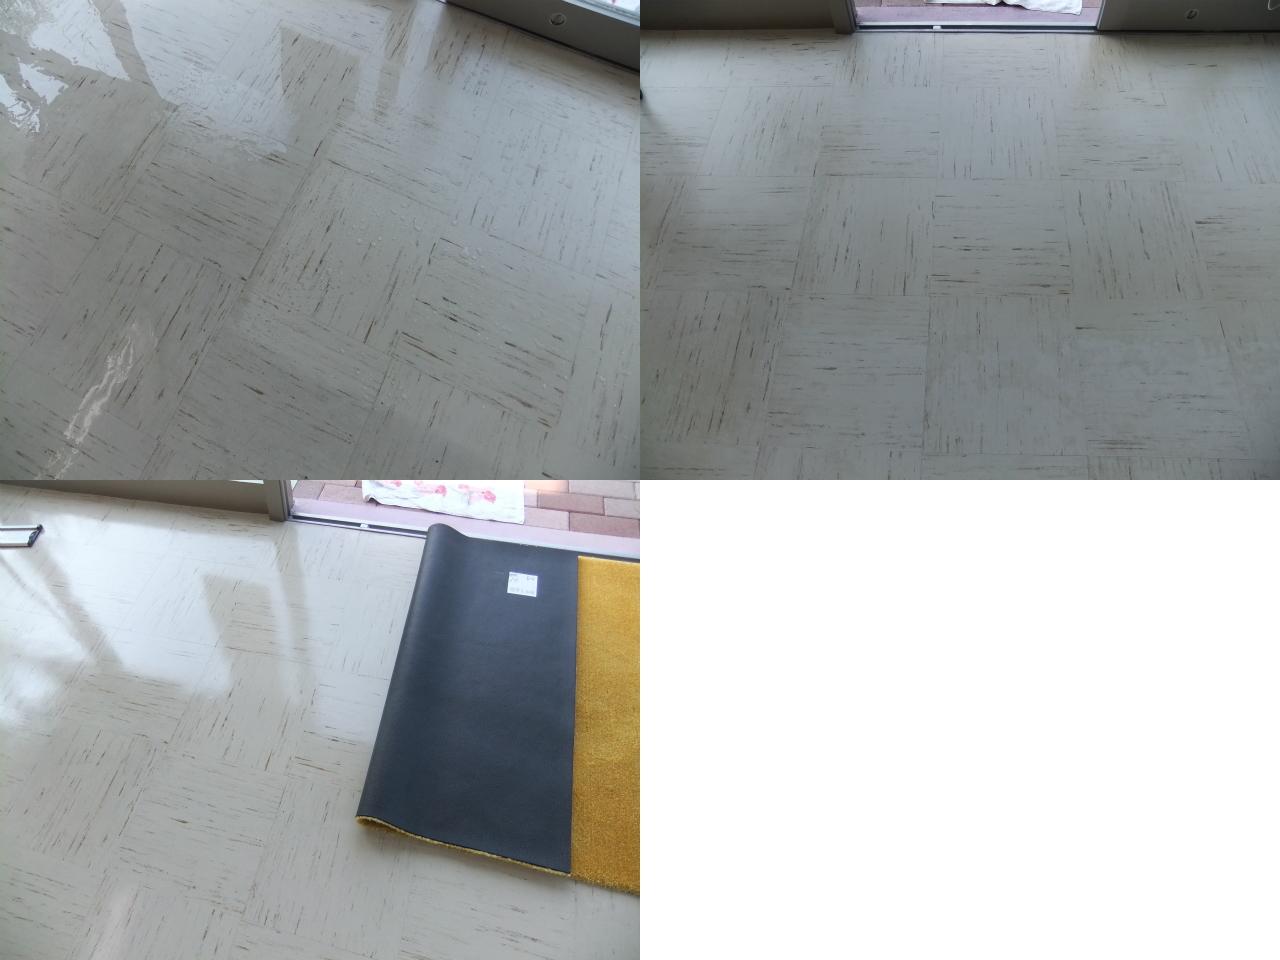 http://ajras.net/images/120726-floor1.jpg